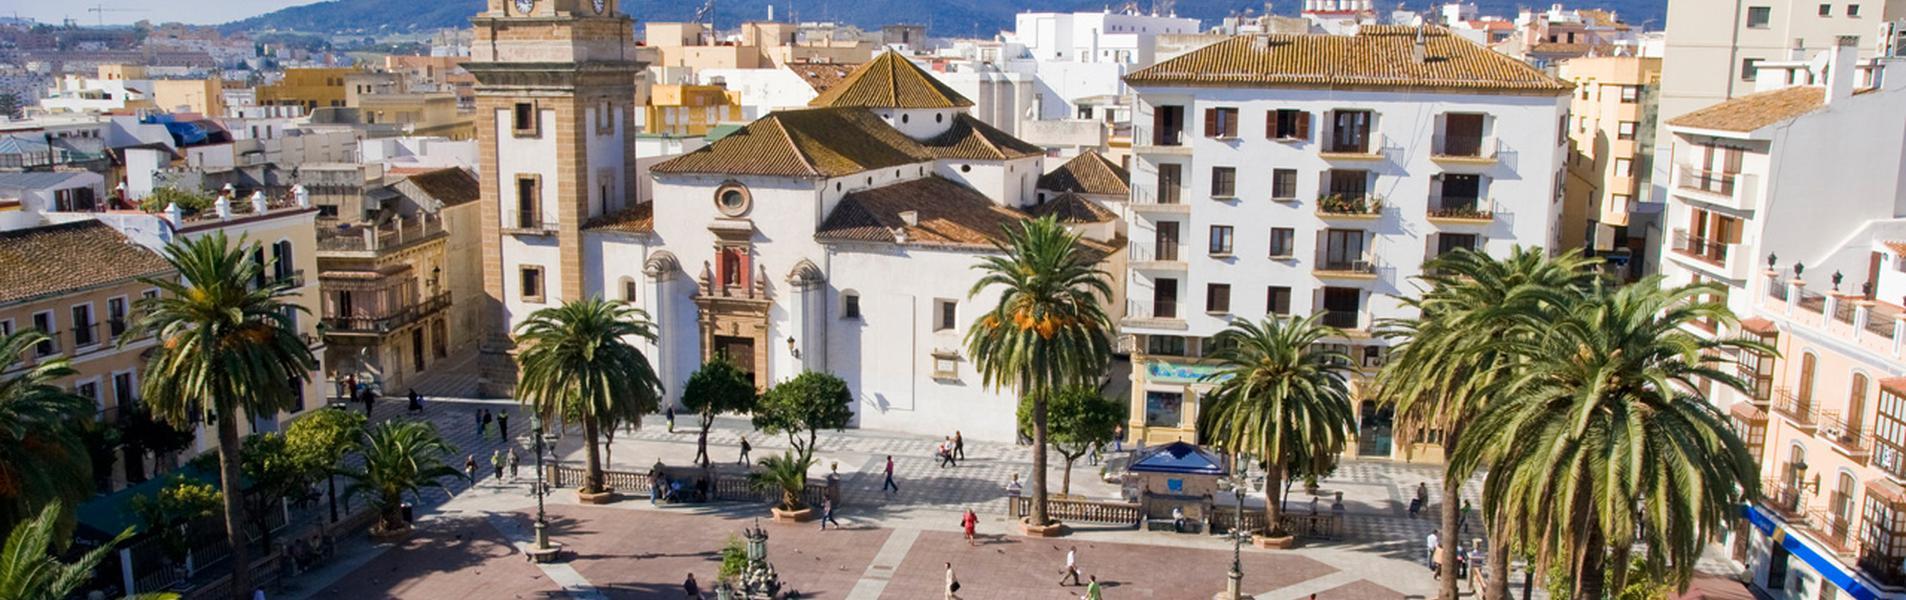 Umzug nach Algeciras